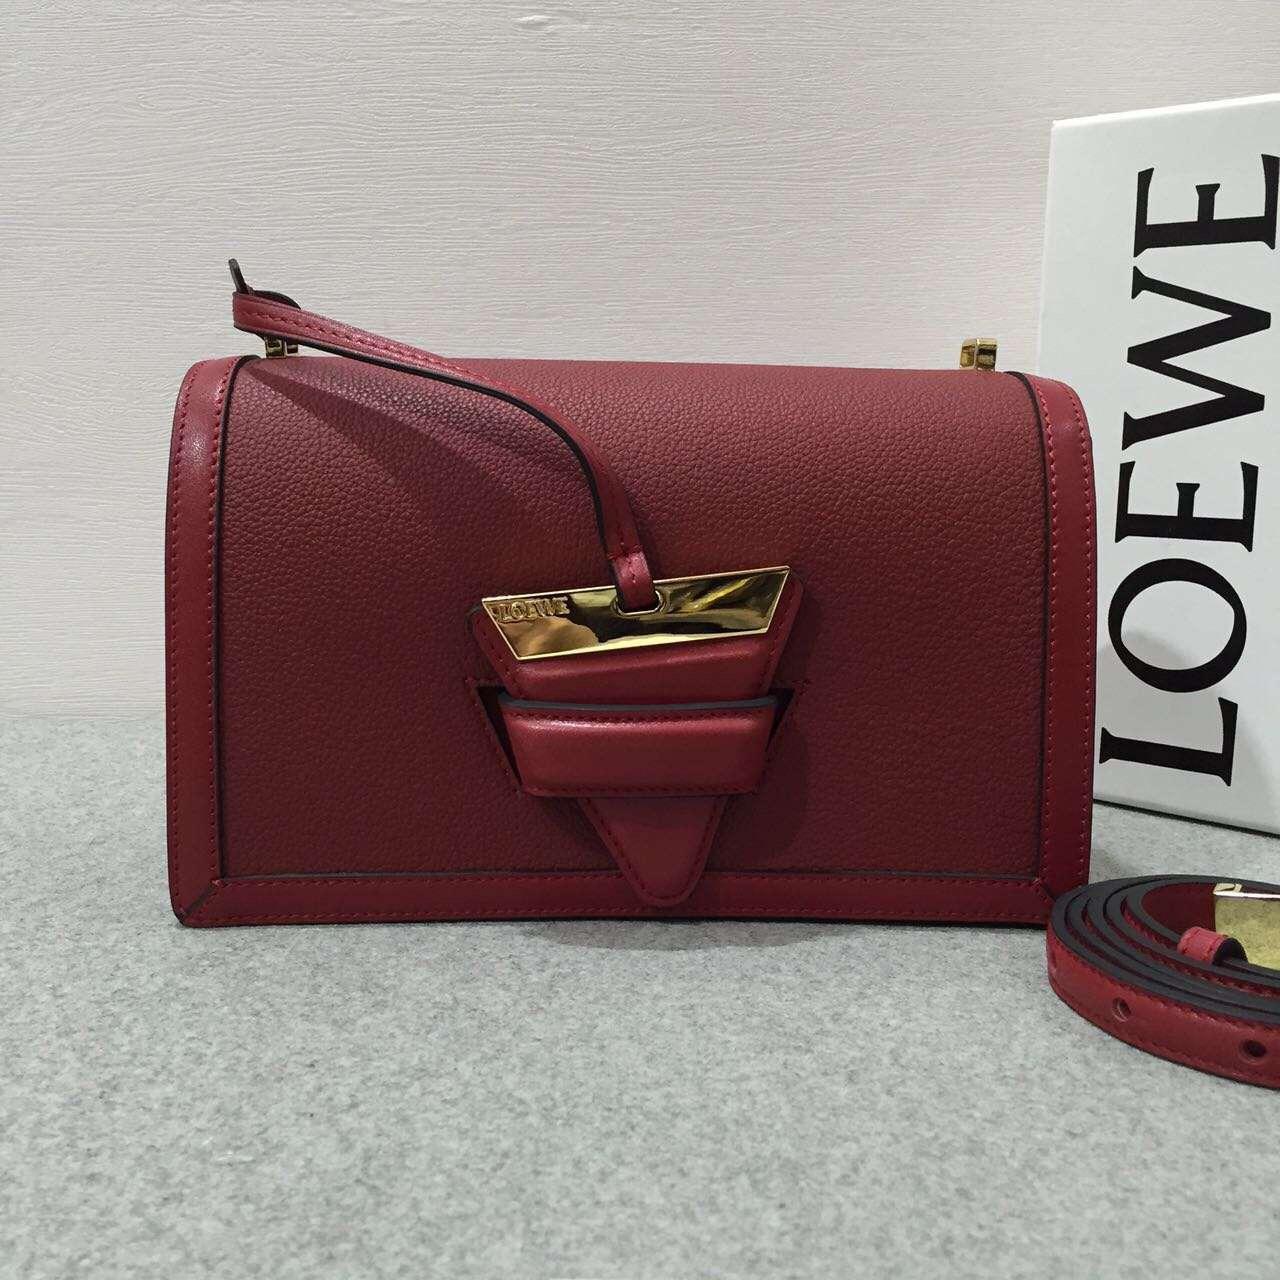 Loewe羅意威 巴塞羅那三角形包 Barcelona Bag 胭脂紅